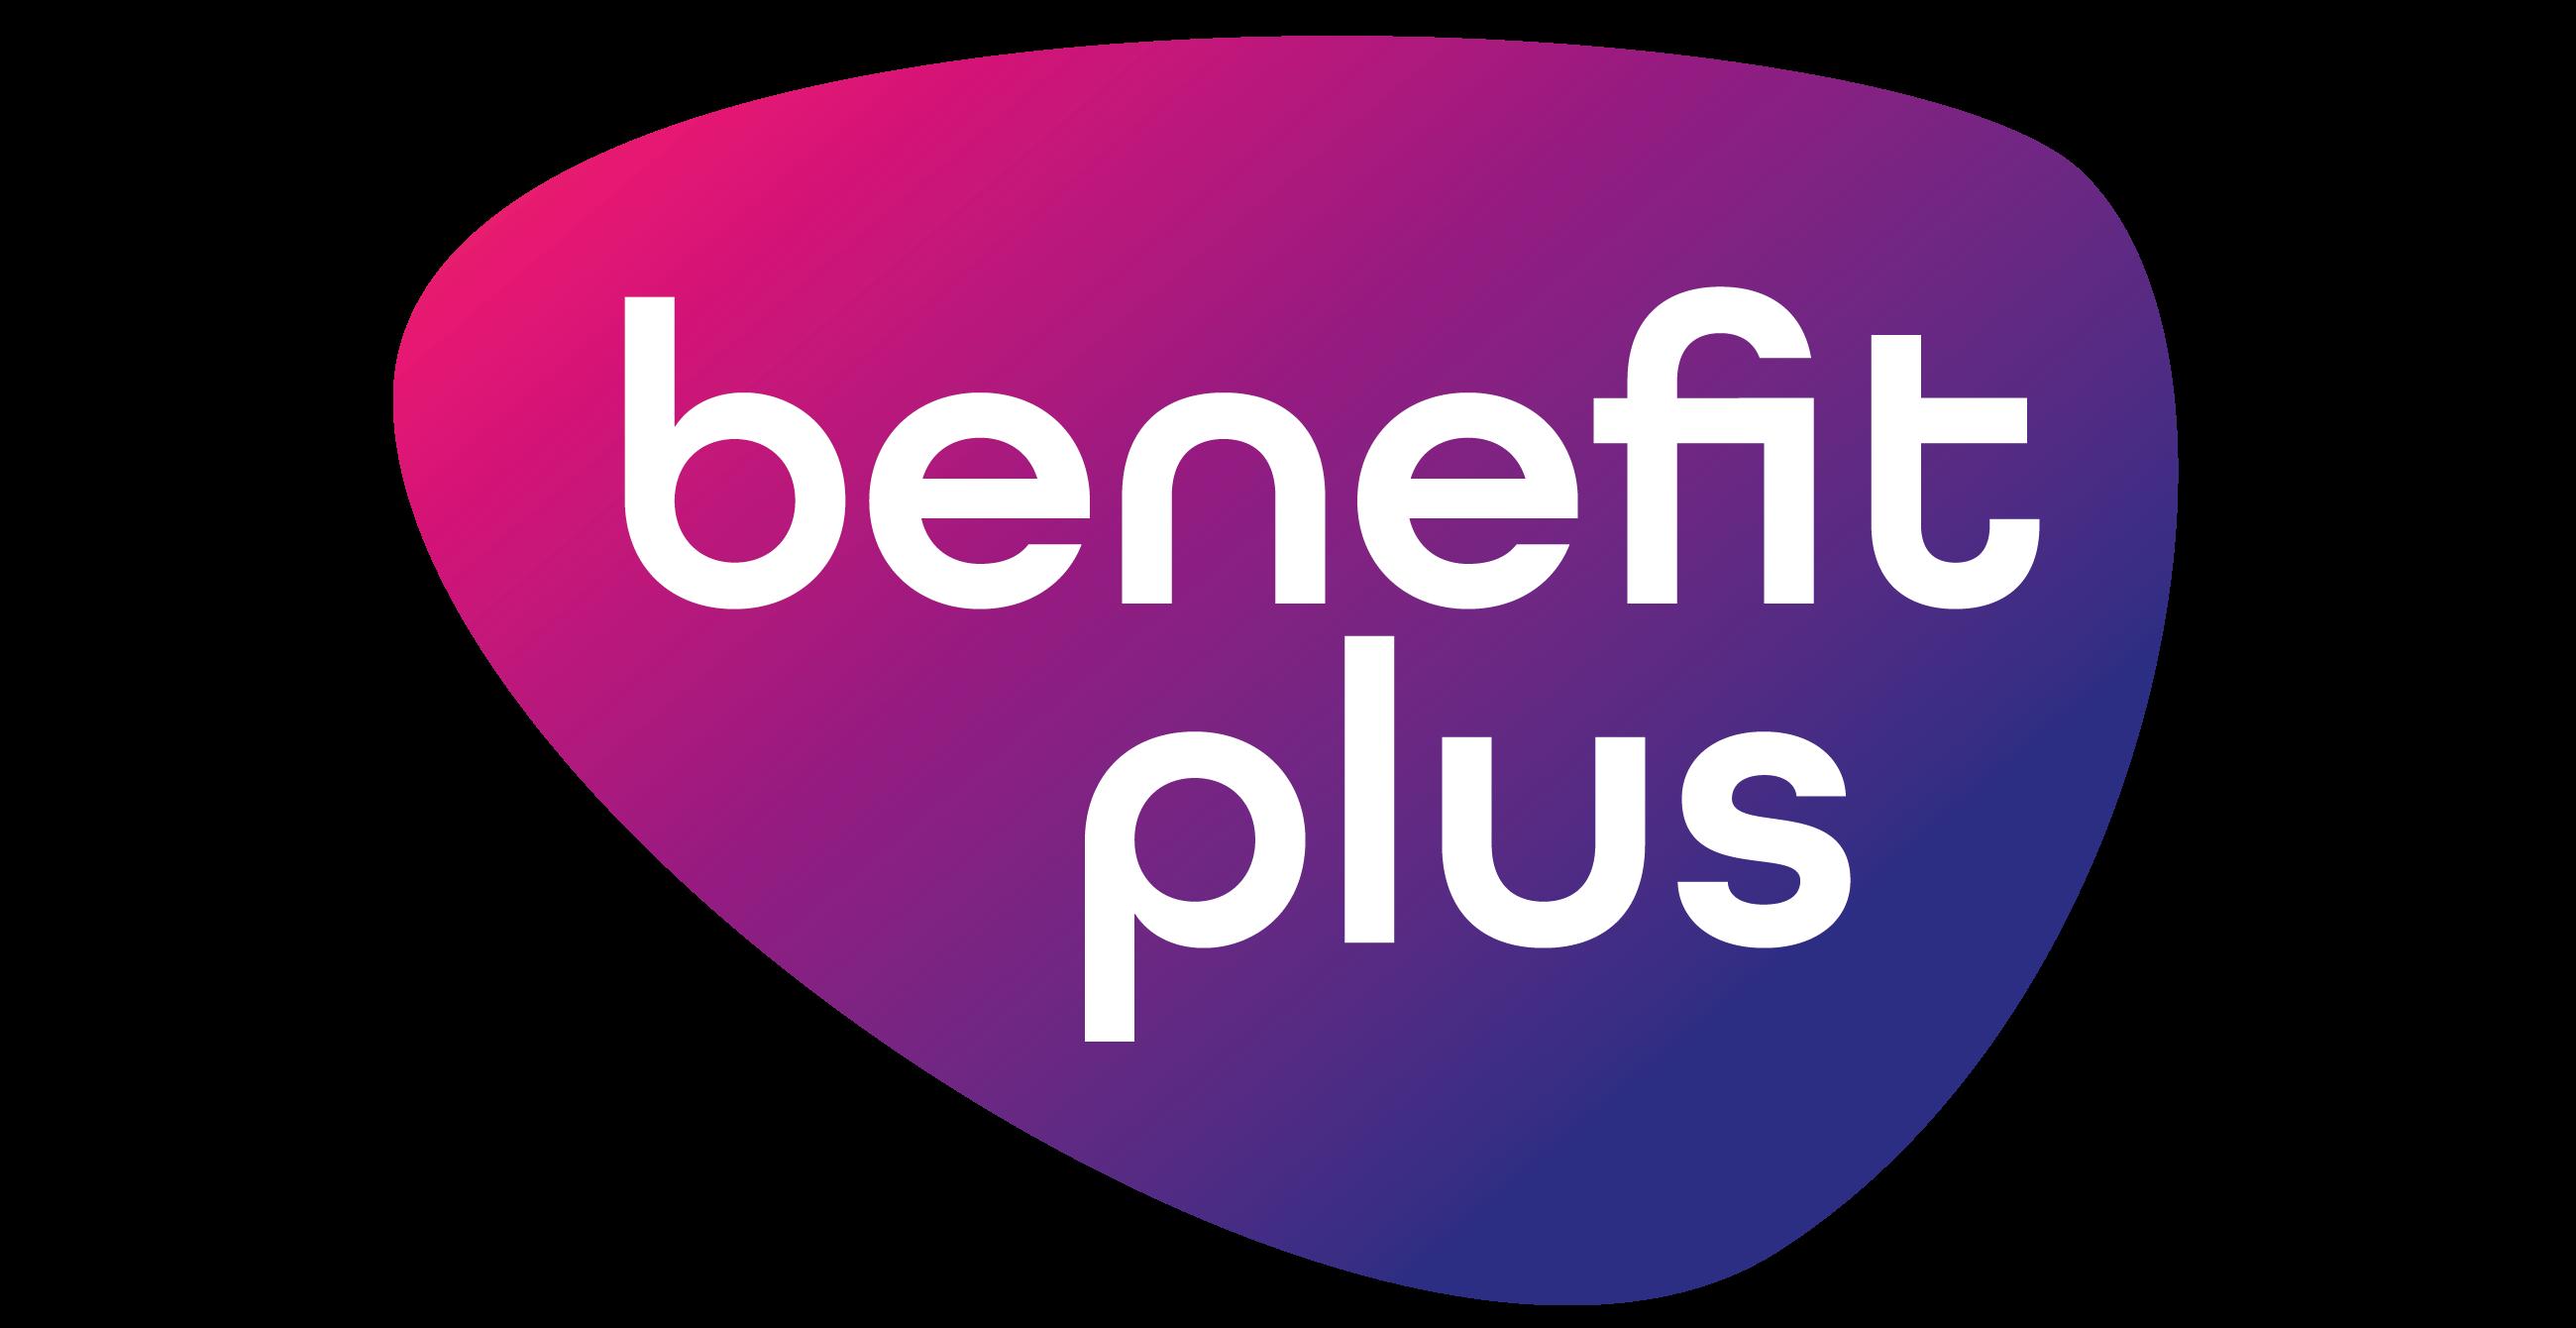 Benefit Plus logo